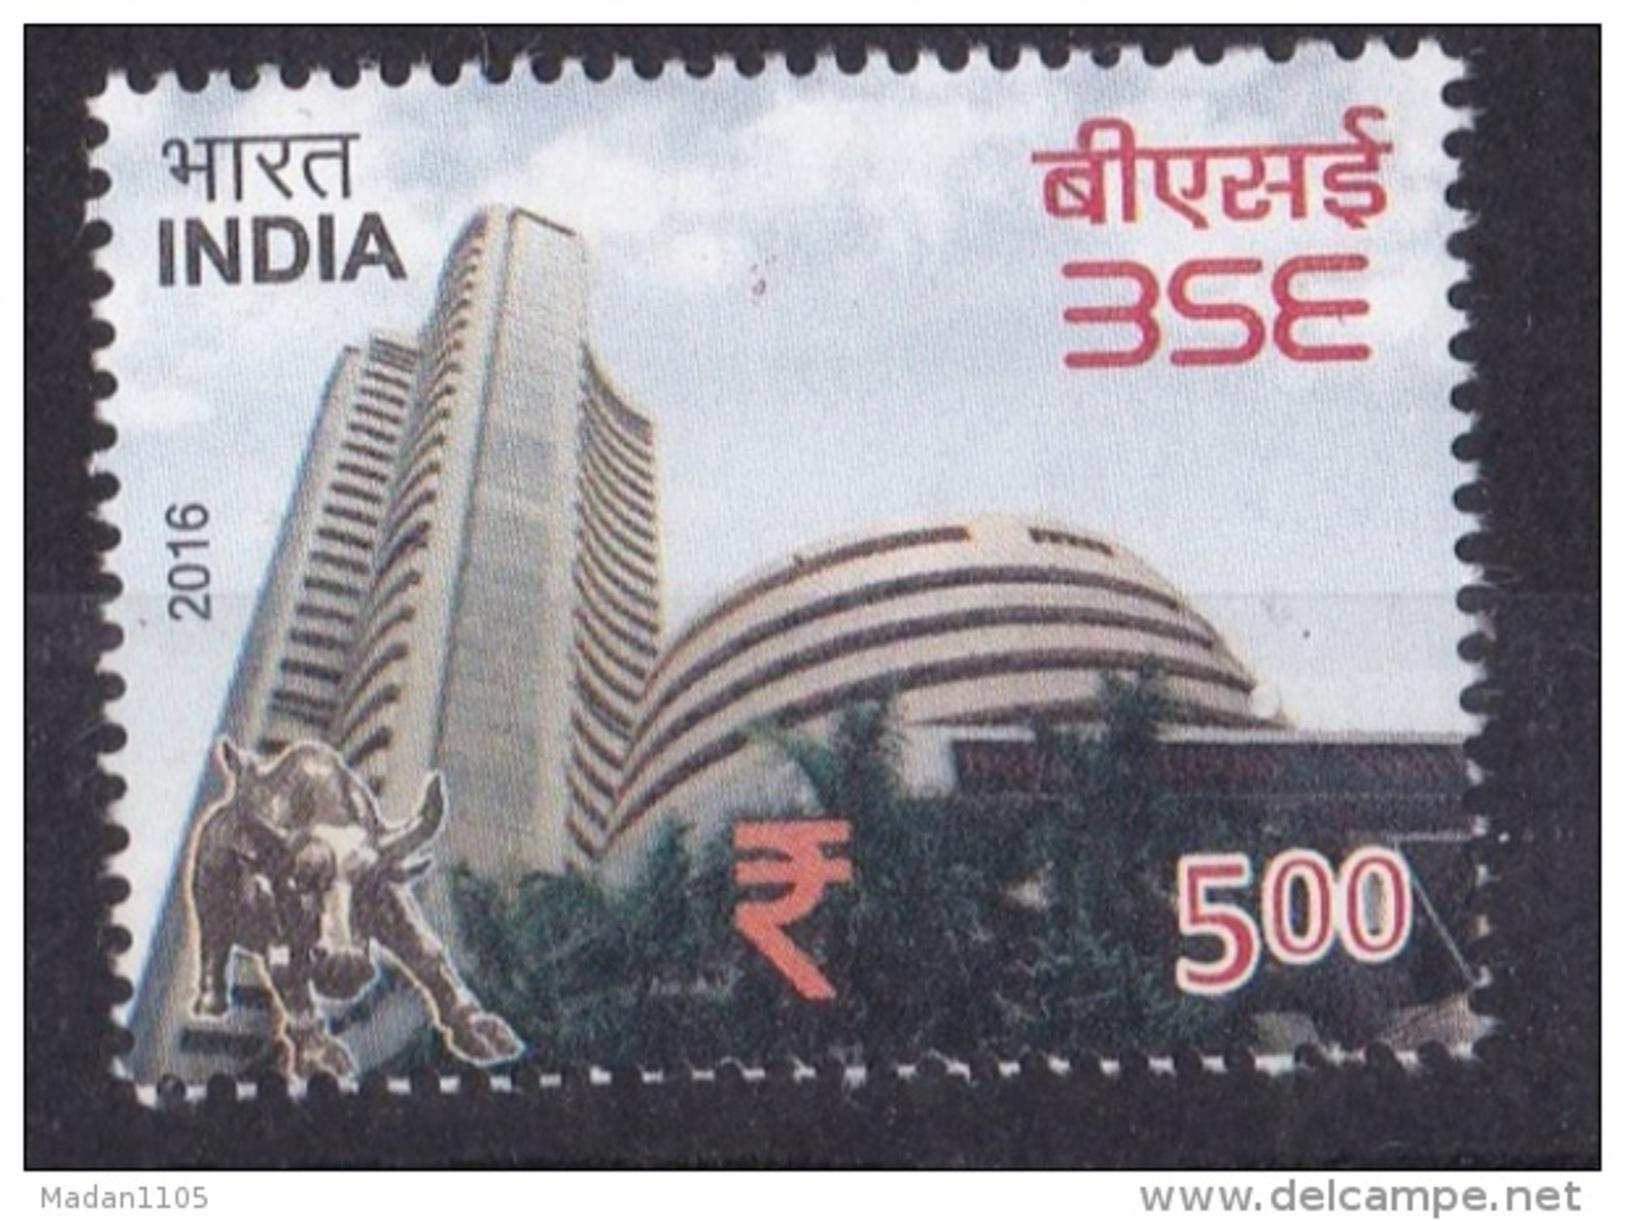 INDIA, 2016, BSE, Bombay Stock Exchange, 1v, MNH, (**) - India